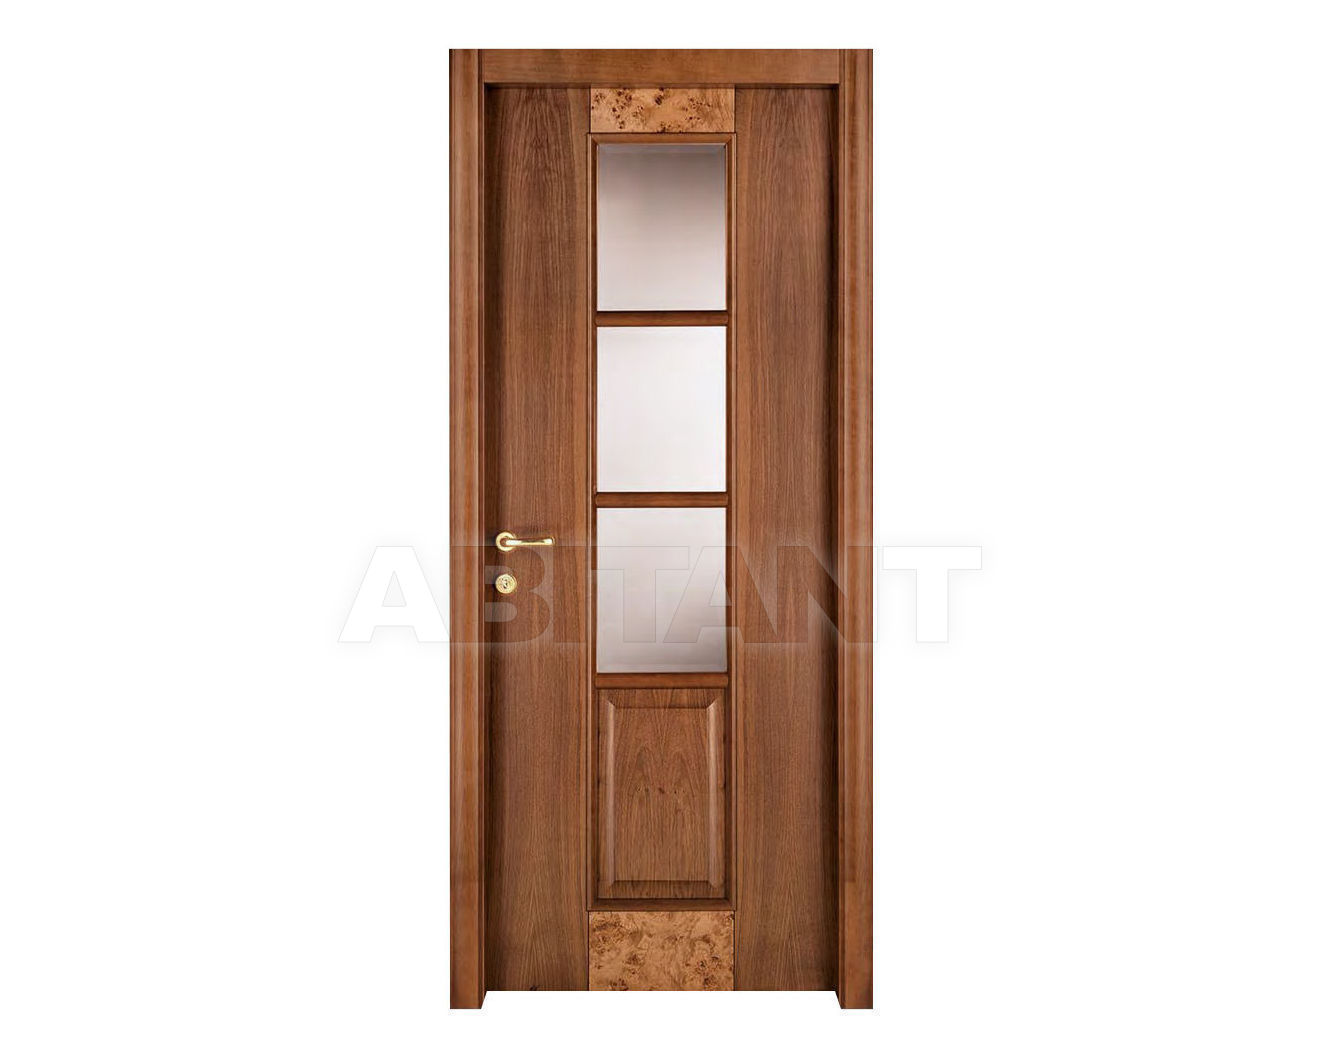 Купить Дверь деревянная Fioravazzi Classiche PATRIZIA 26 MANTOVANA